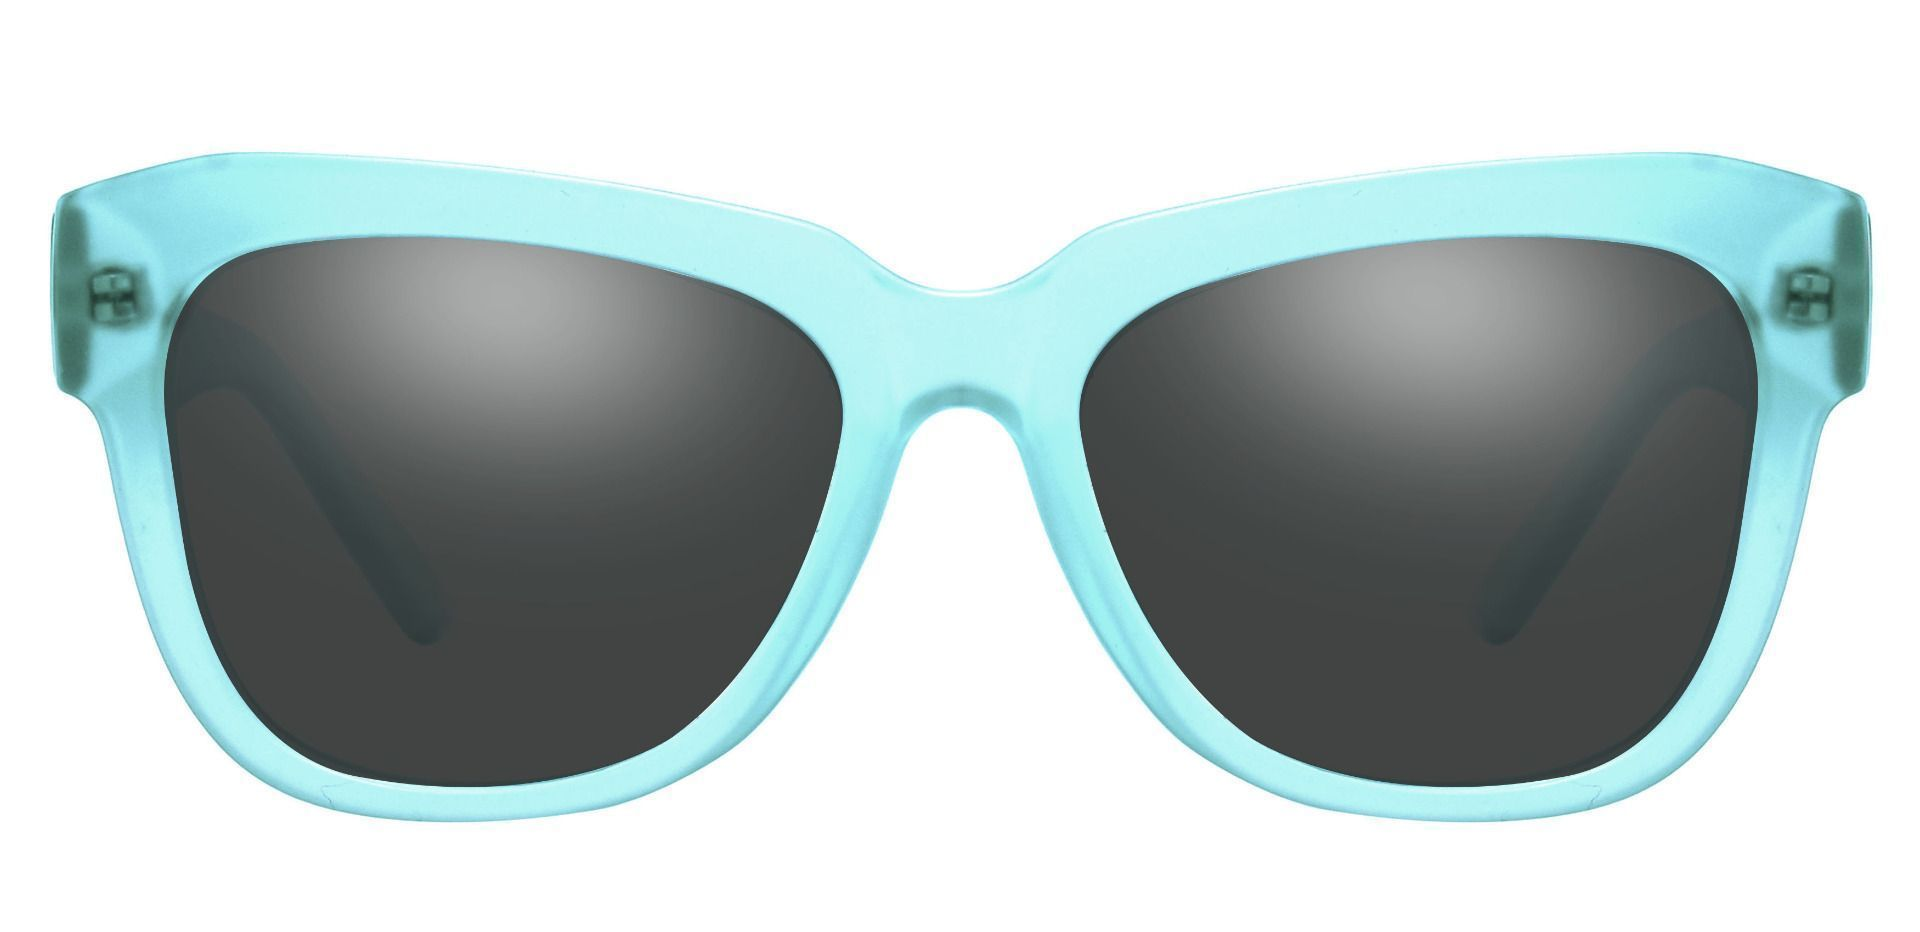 Gina Cat-Eye Reading Sunglasses - Blue Frame With Gray Lenses